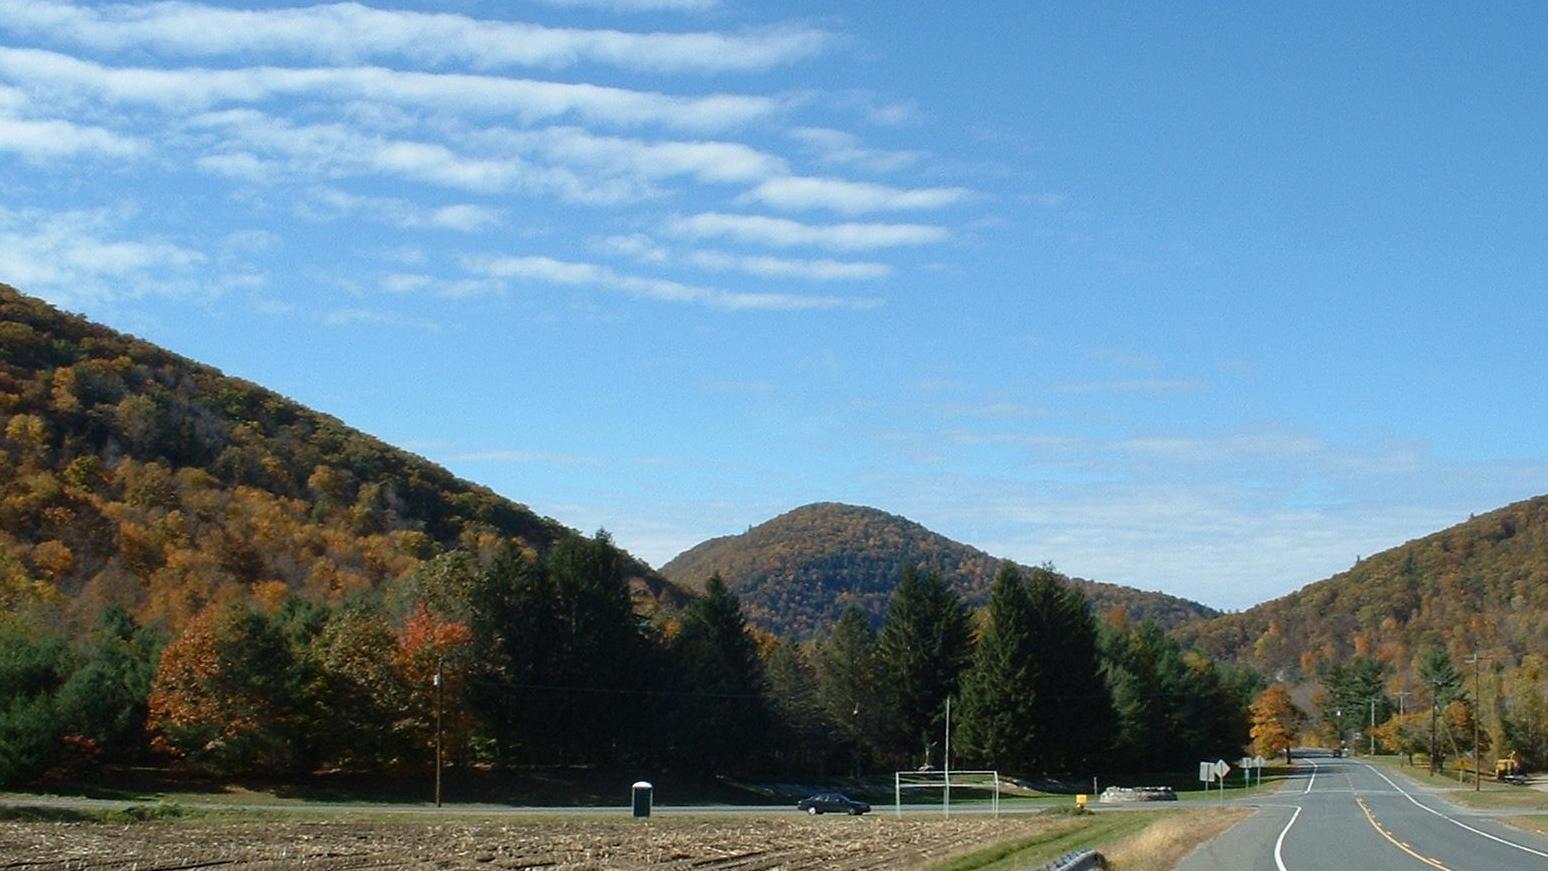 Mohawk Trail U.S. National Park Service